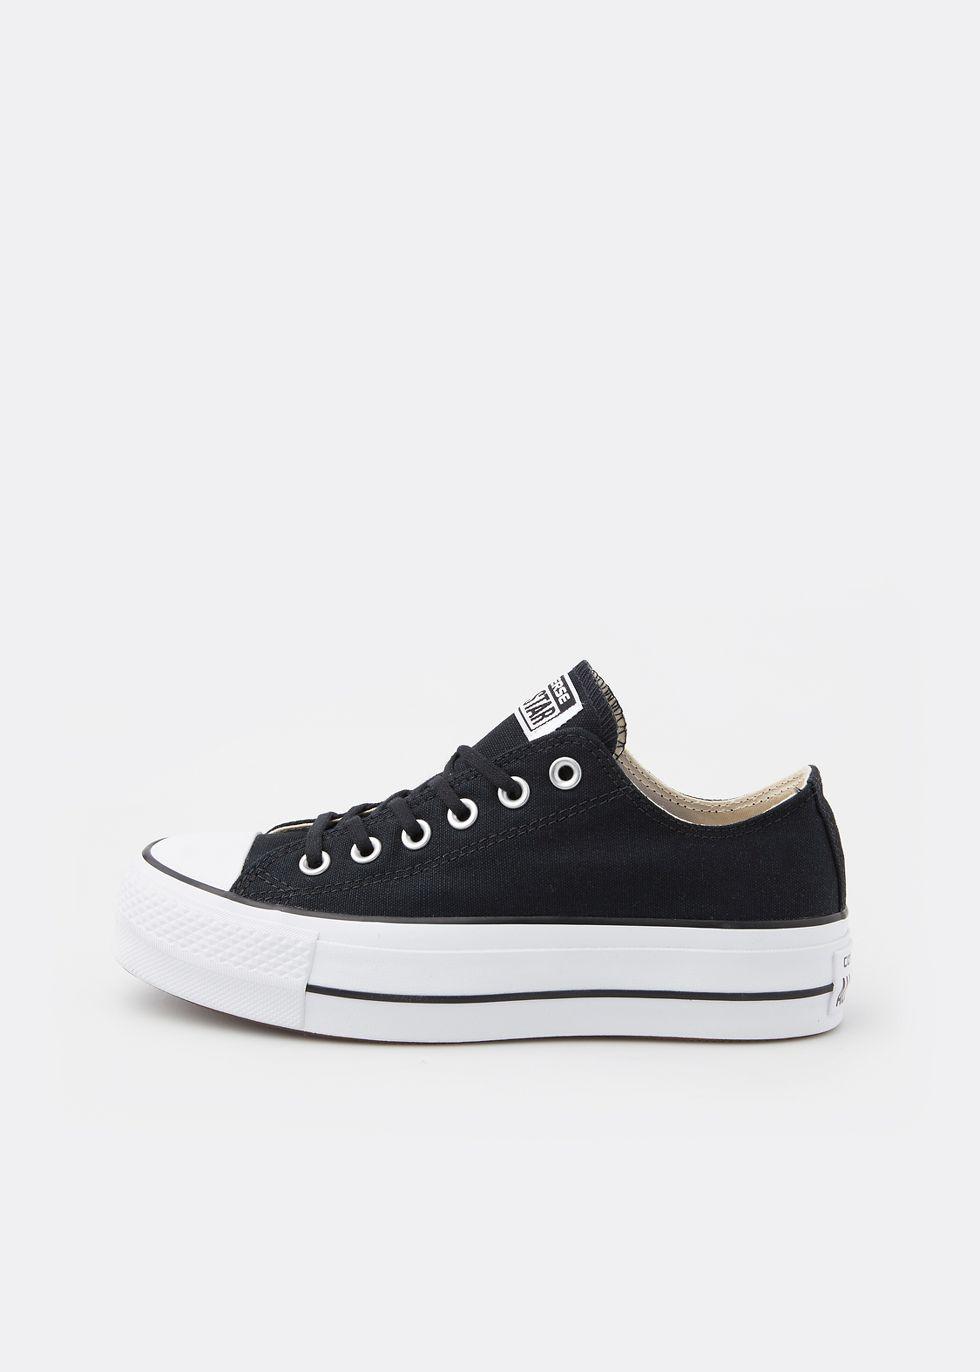 f286e9e076e Converse Plateau Sneakers   The Sting